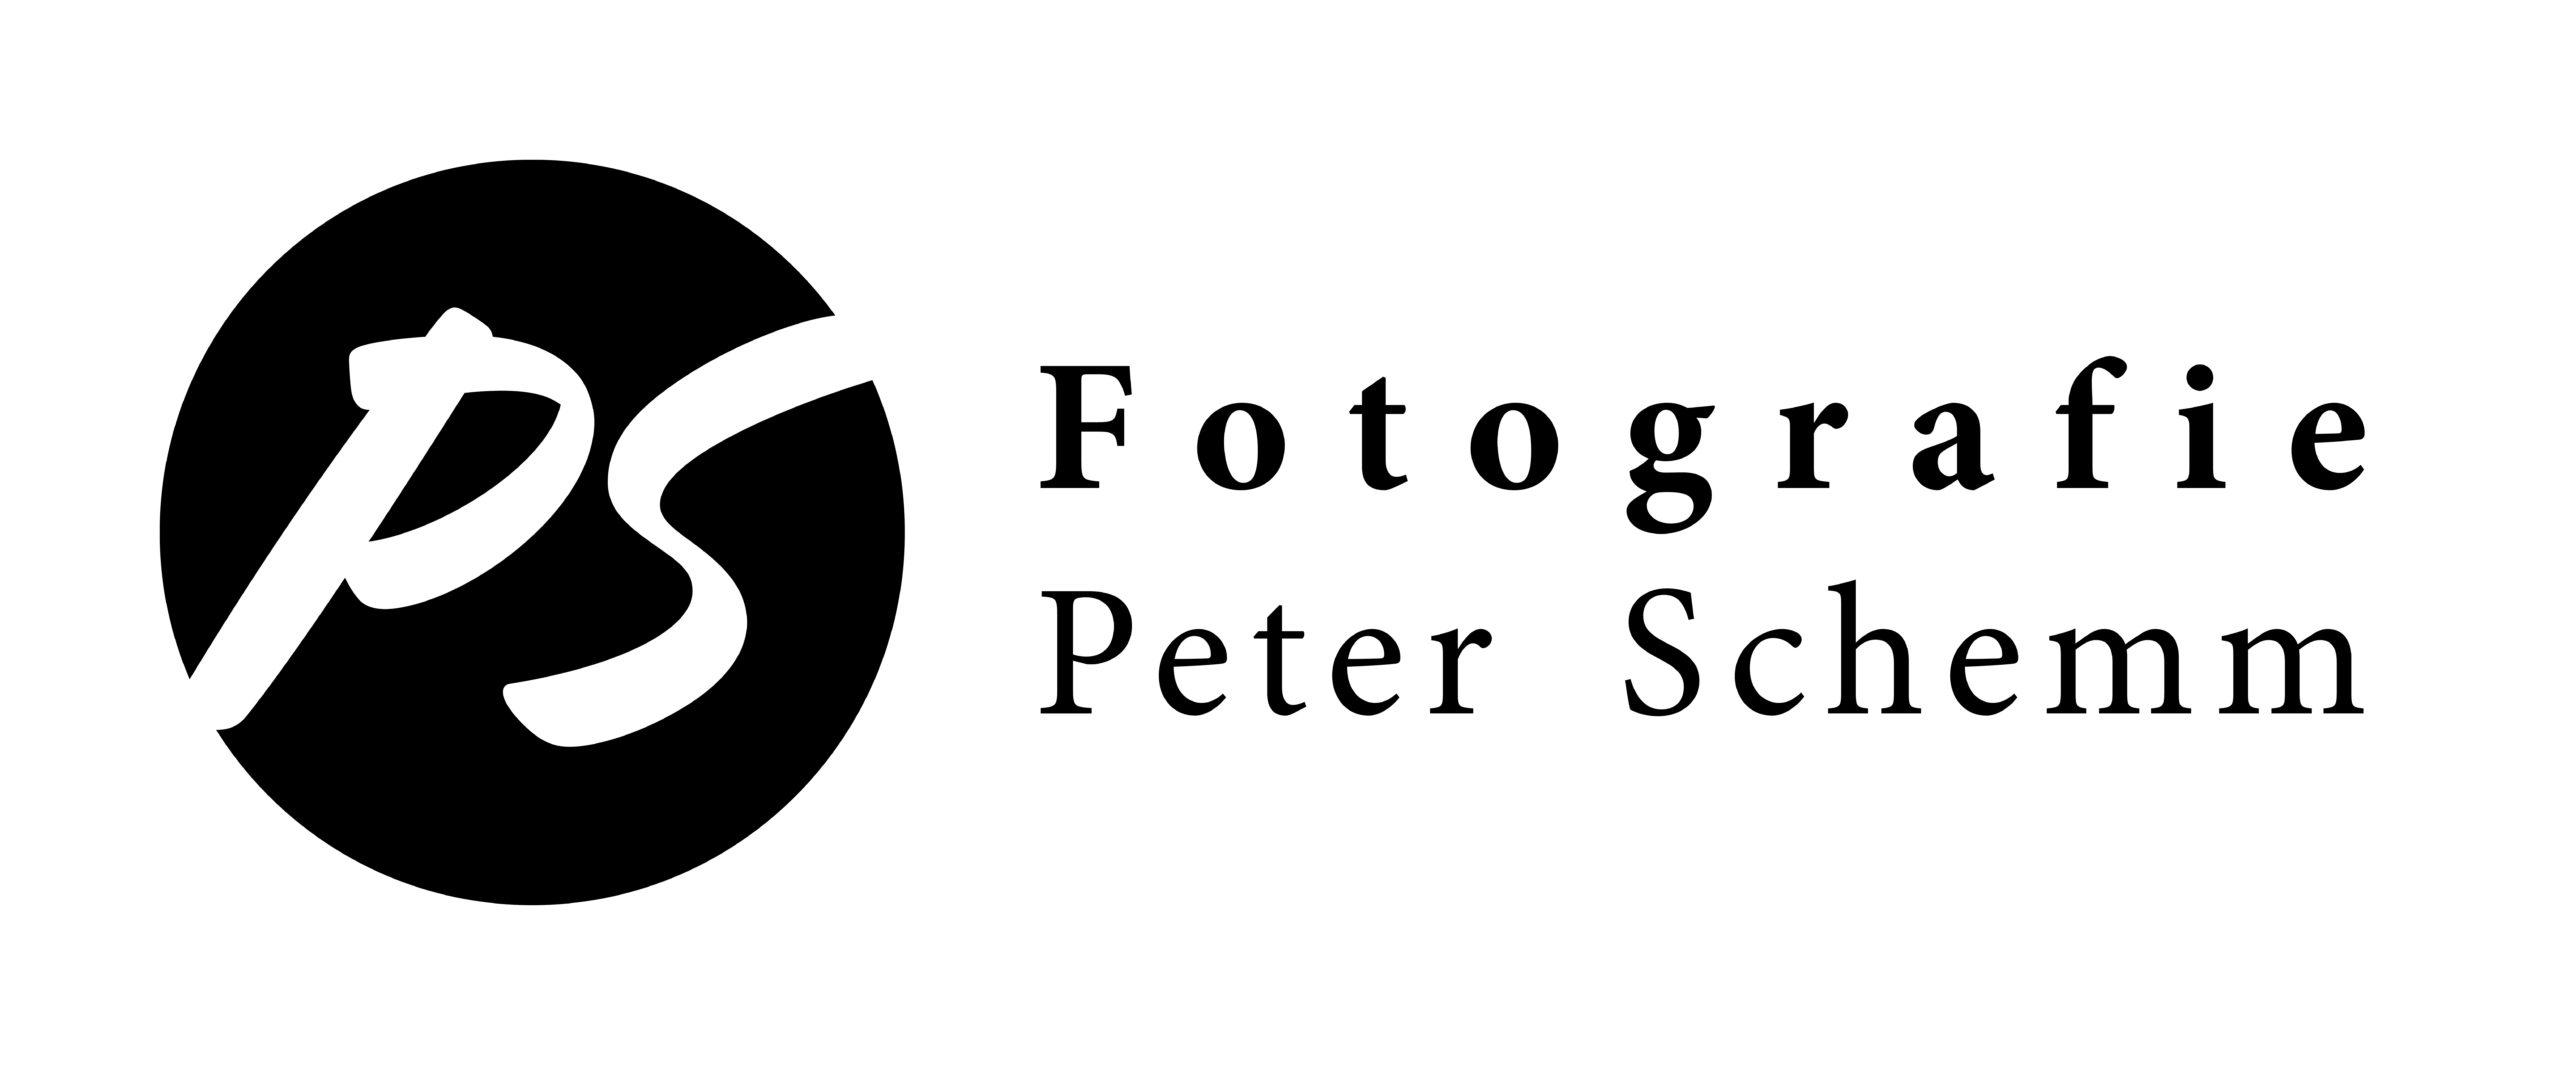 Peter Schemm Fotografie Logo